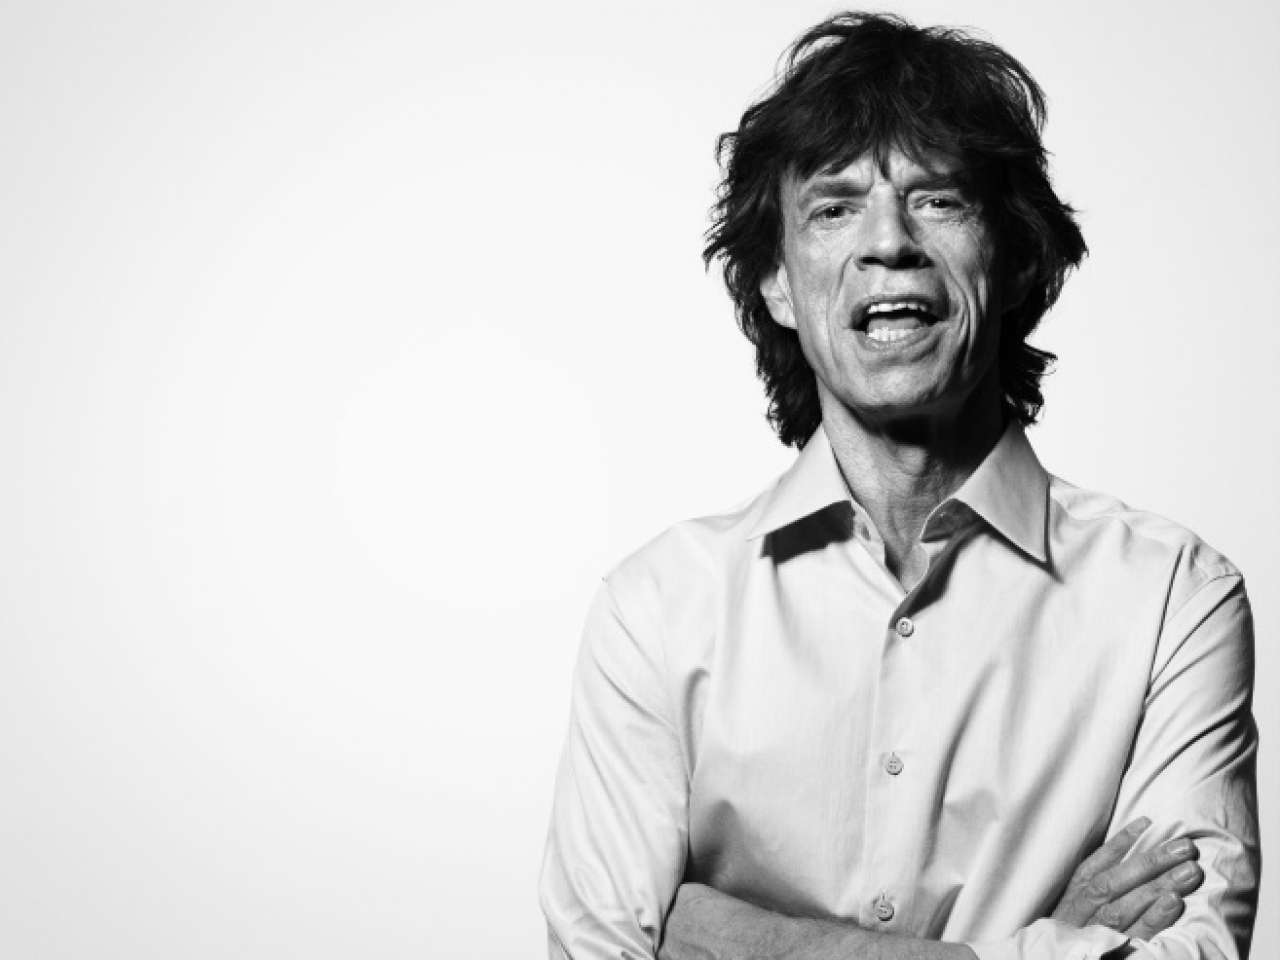 Mick Jagger na boca do povo